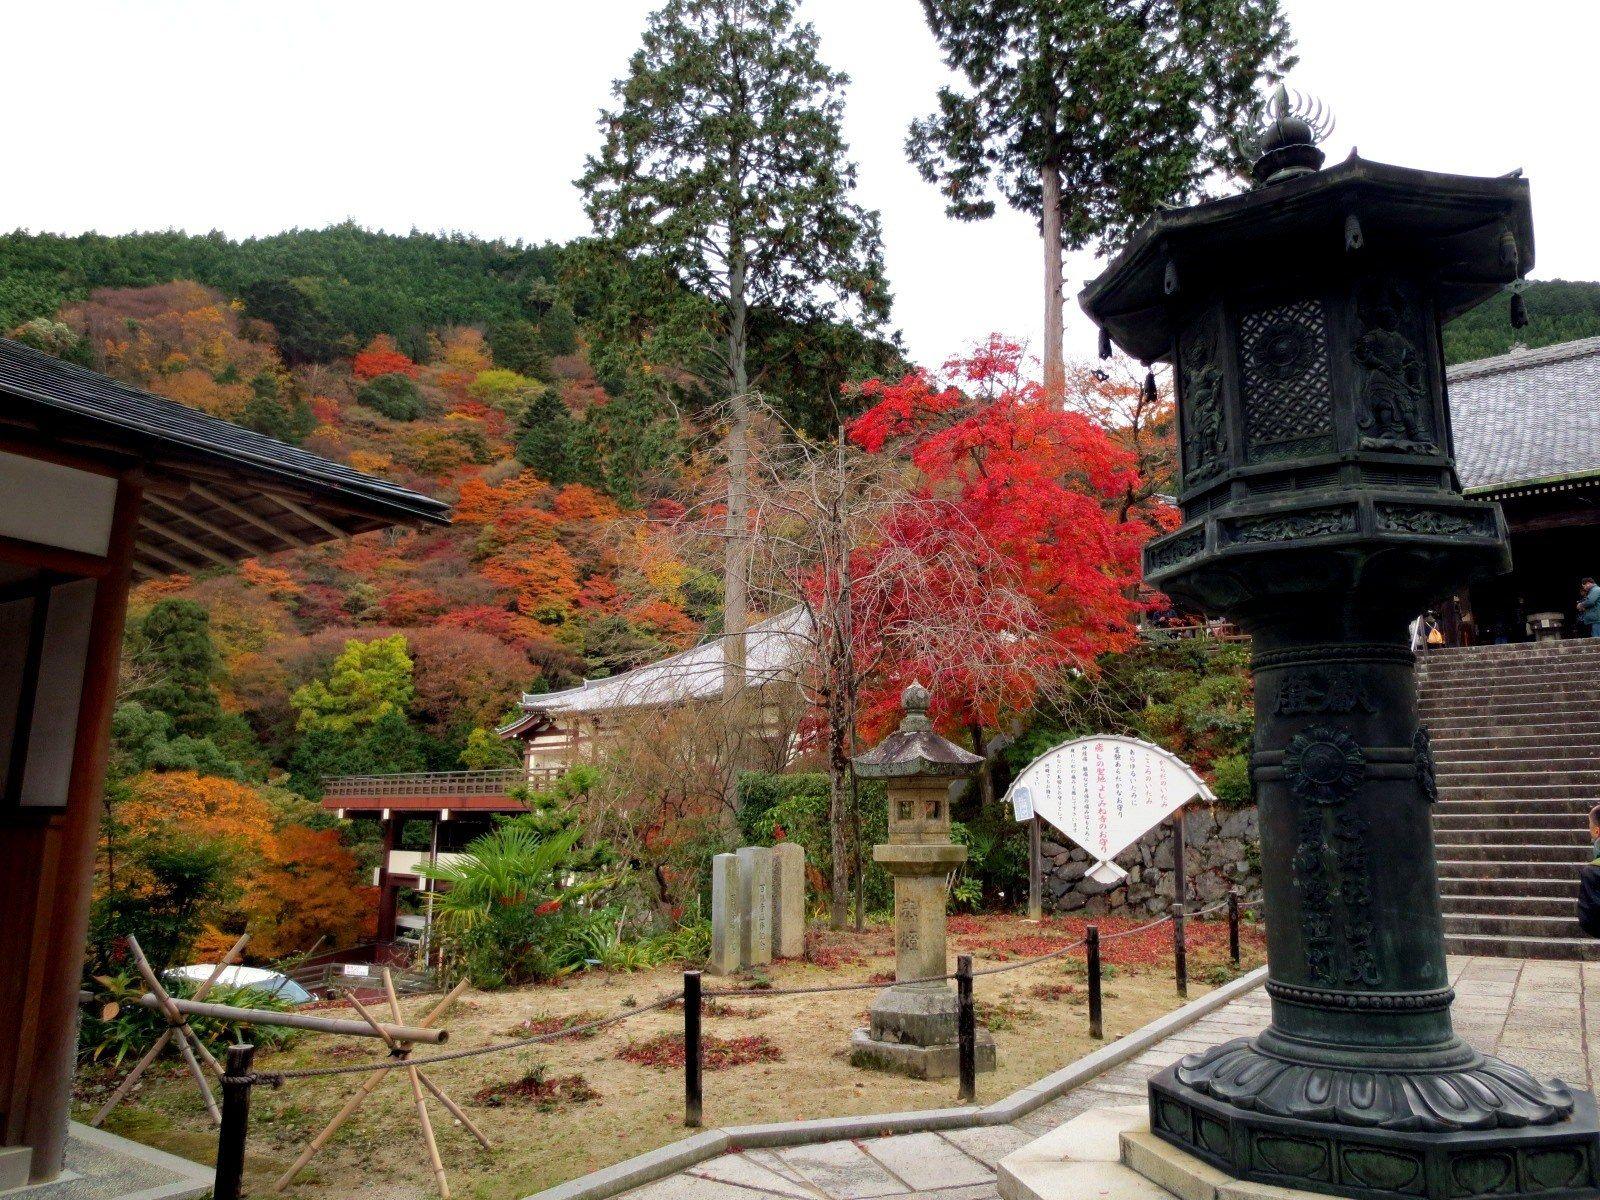 Yoshimine-dera